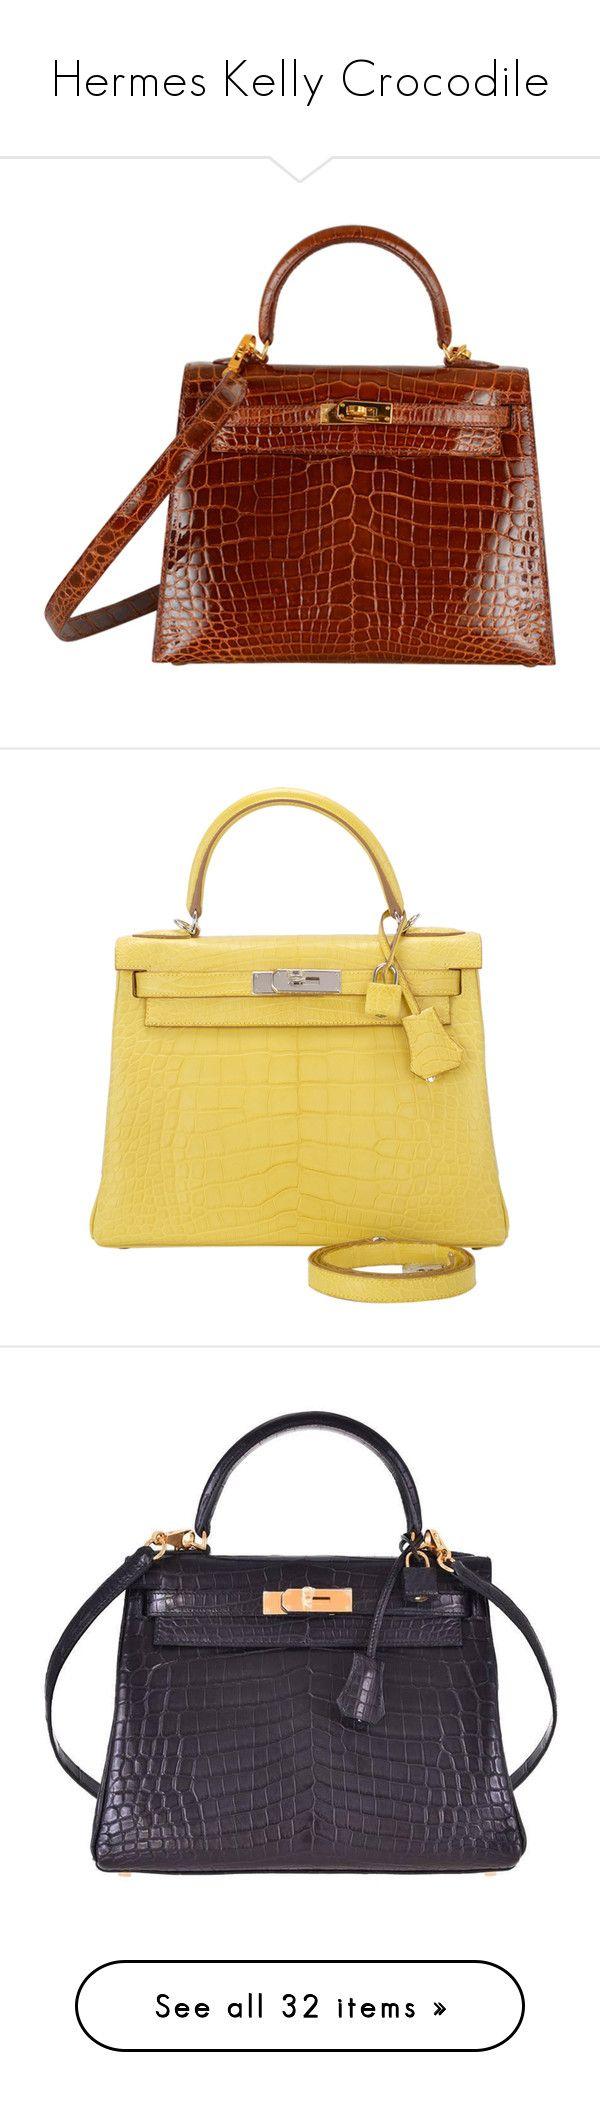 """Hermes Kelly Crocodile"" by angel00005 ❤ liked on Polyvore featuring bags, handbags, hermes, bolsas, hermes bags, hermes bag, hermès, crocodile handbags, crocodile embossed handbags and croc purse"